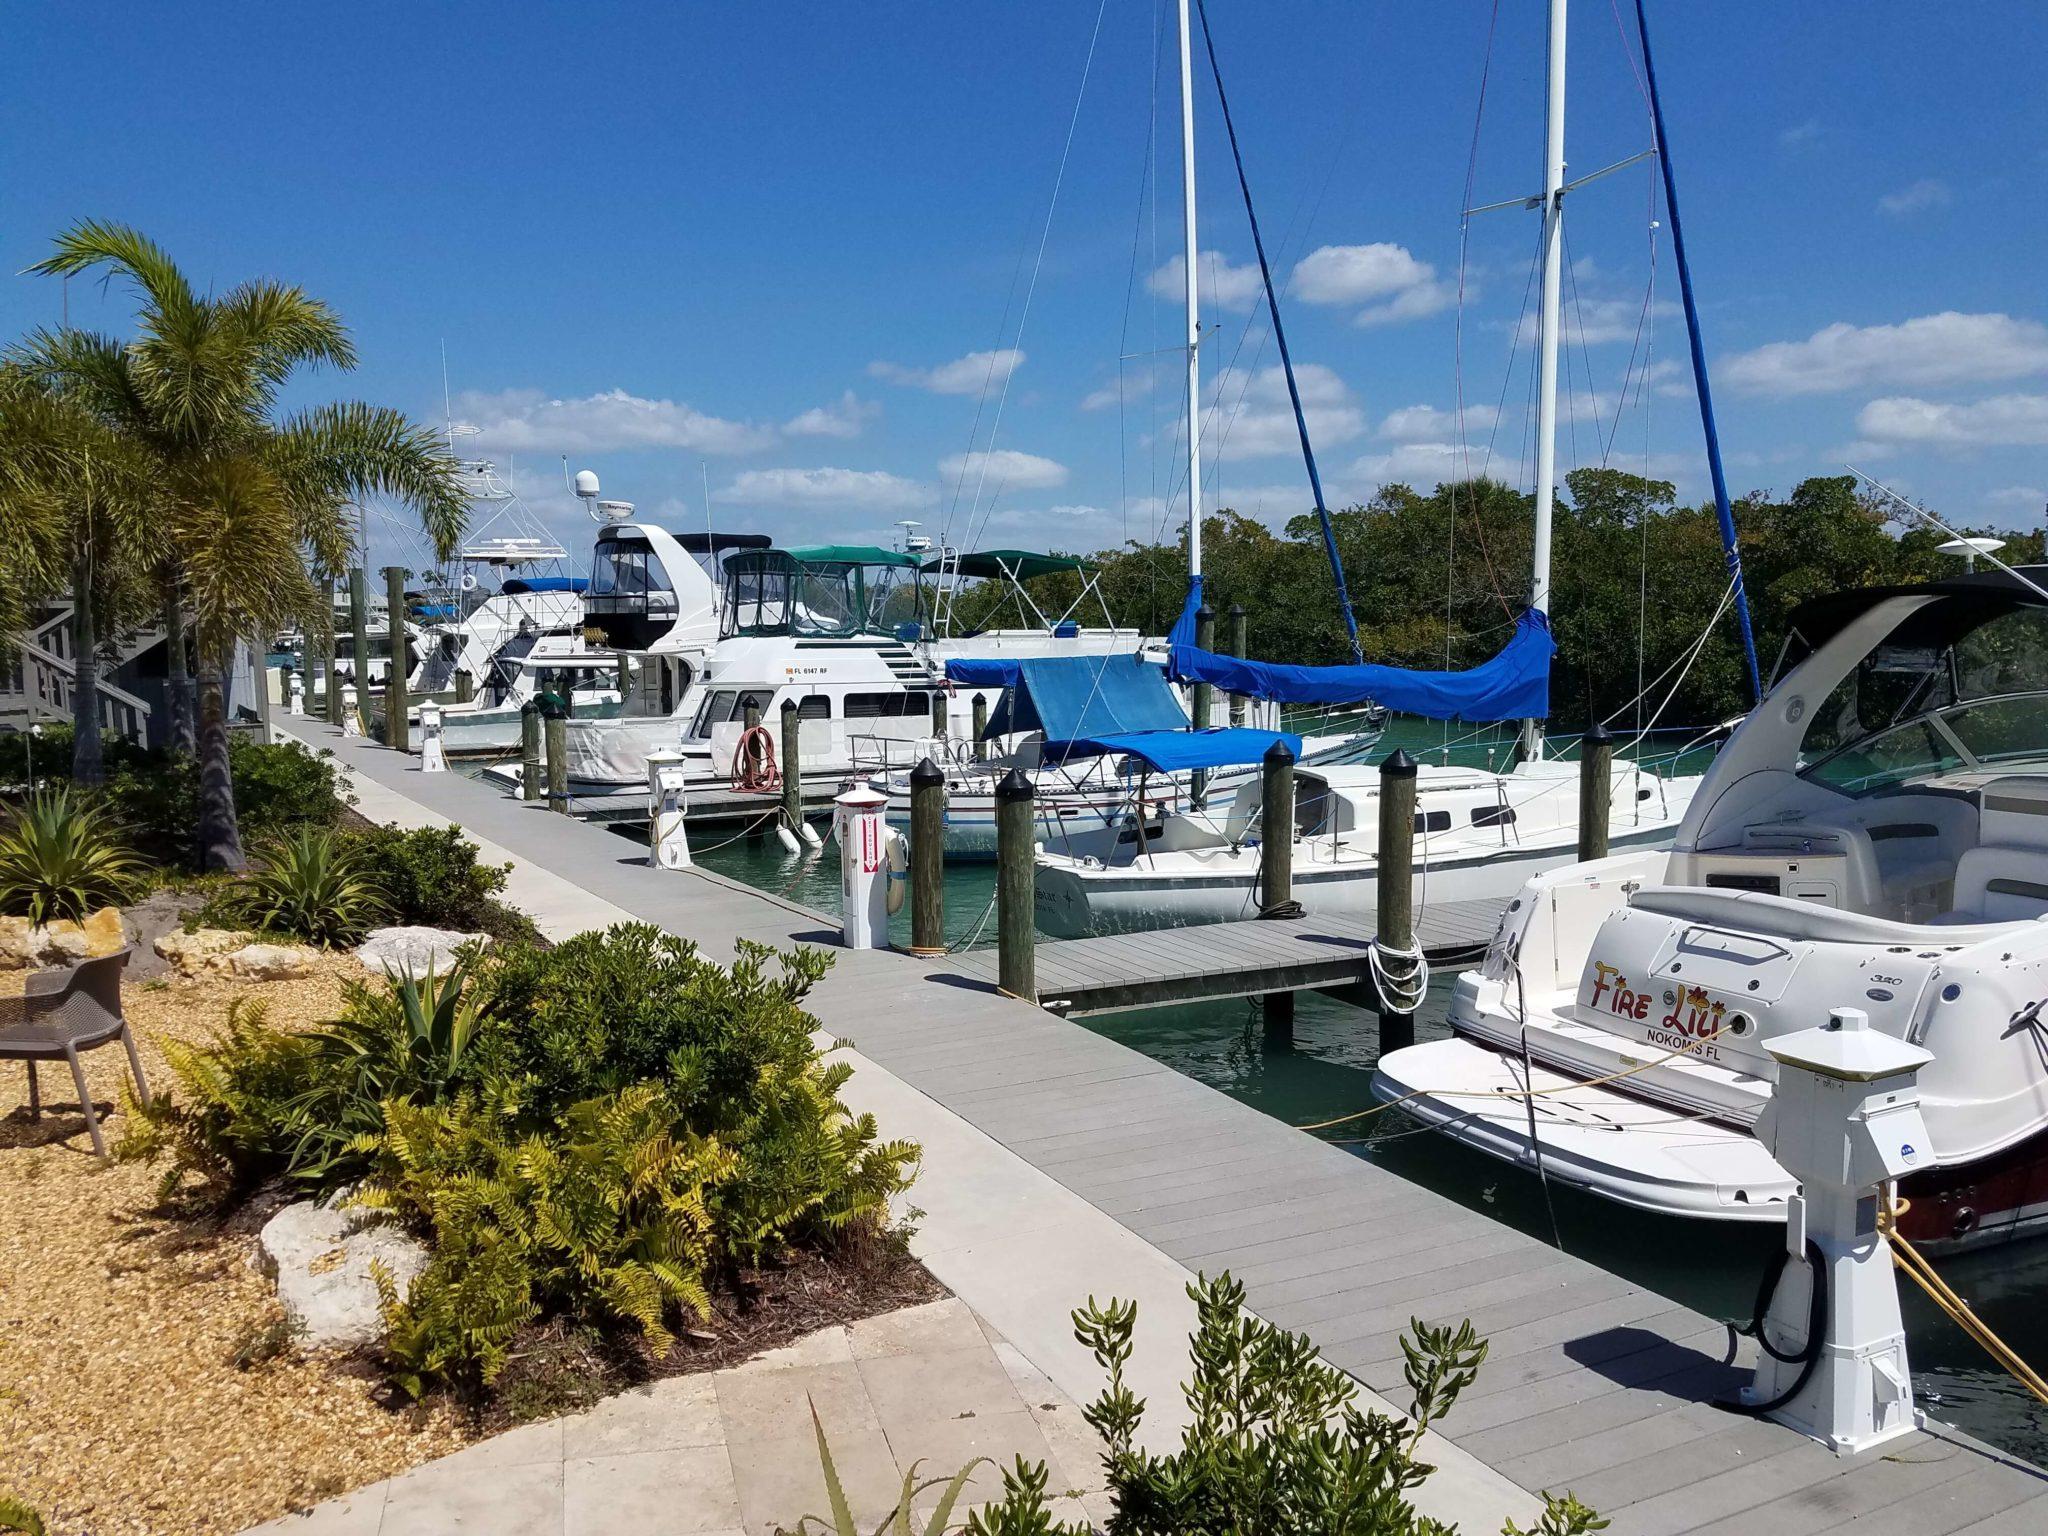 Venice FL Marina - Dock Slip Rentals | Escape Casey Key Resort